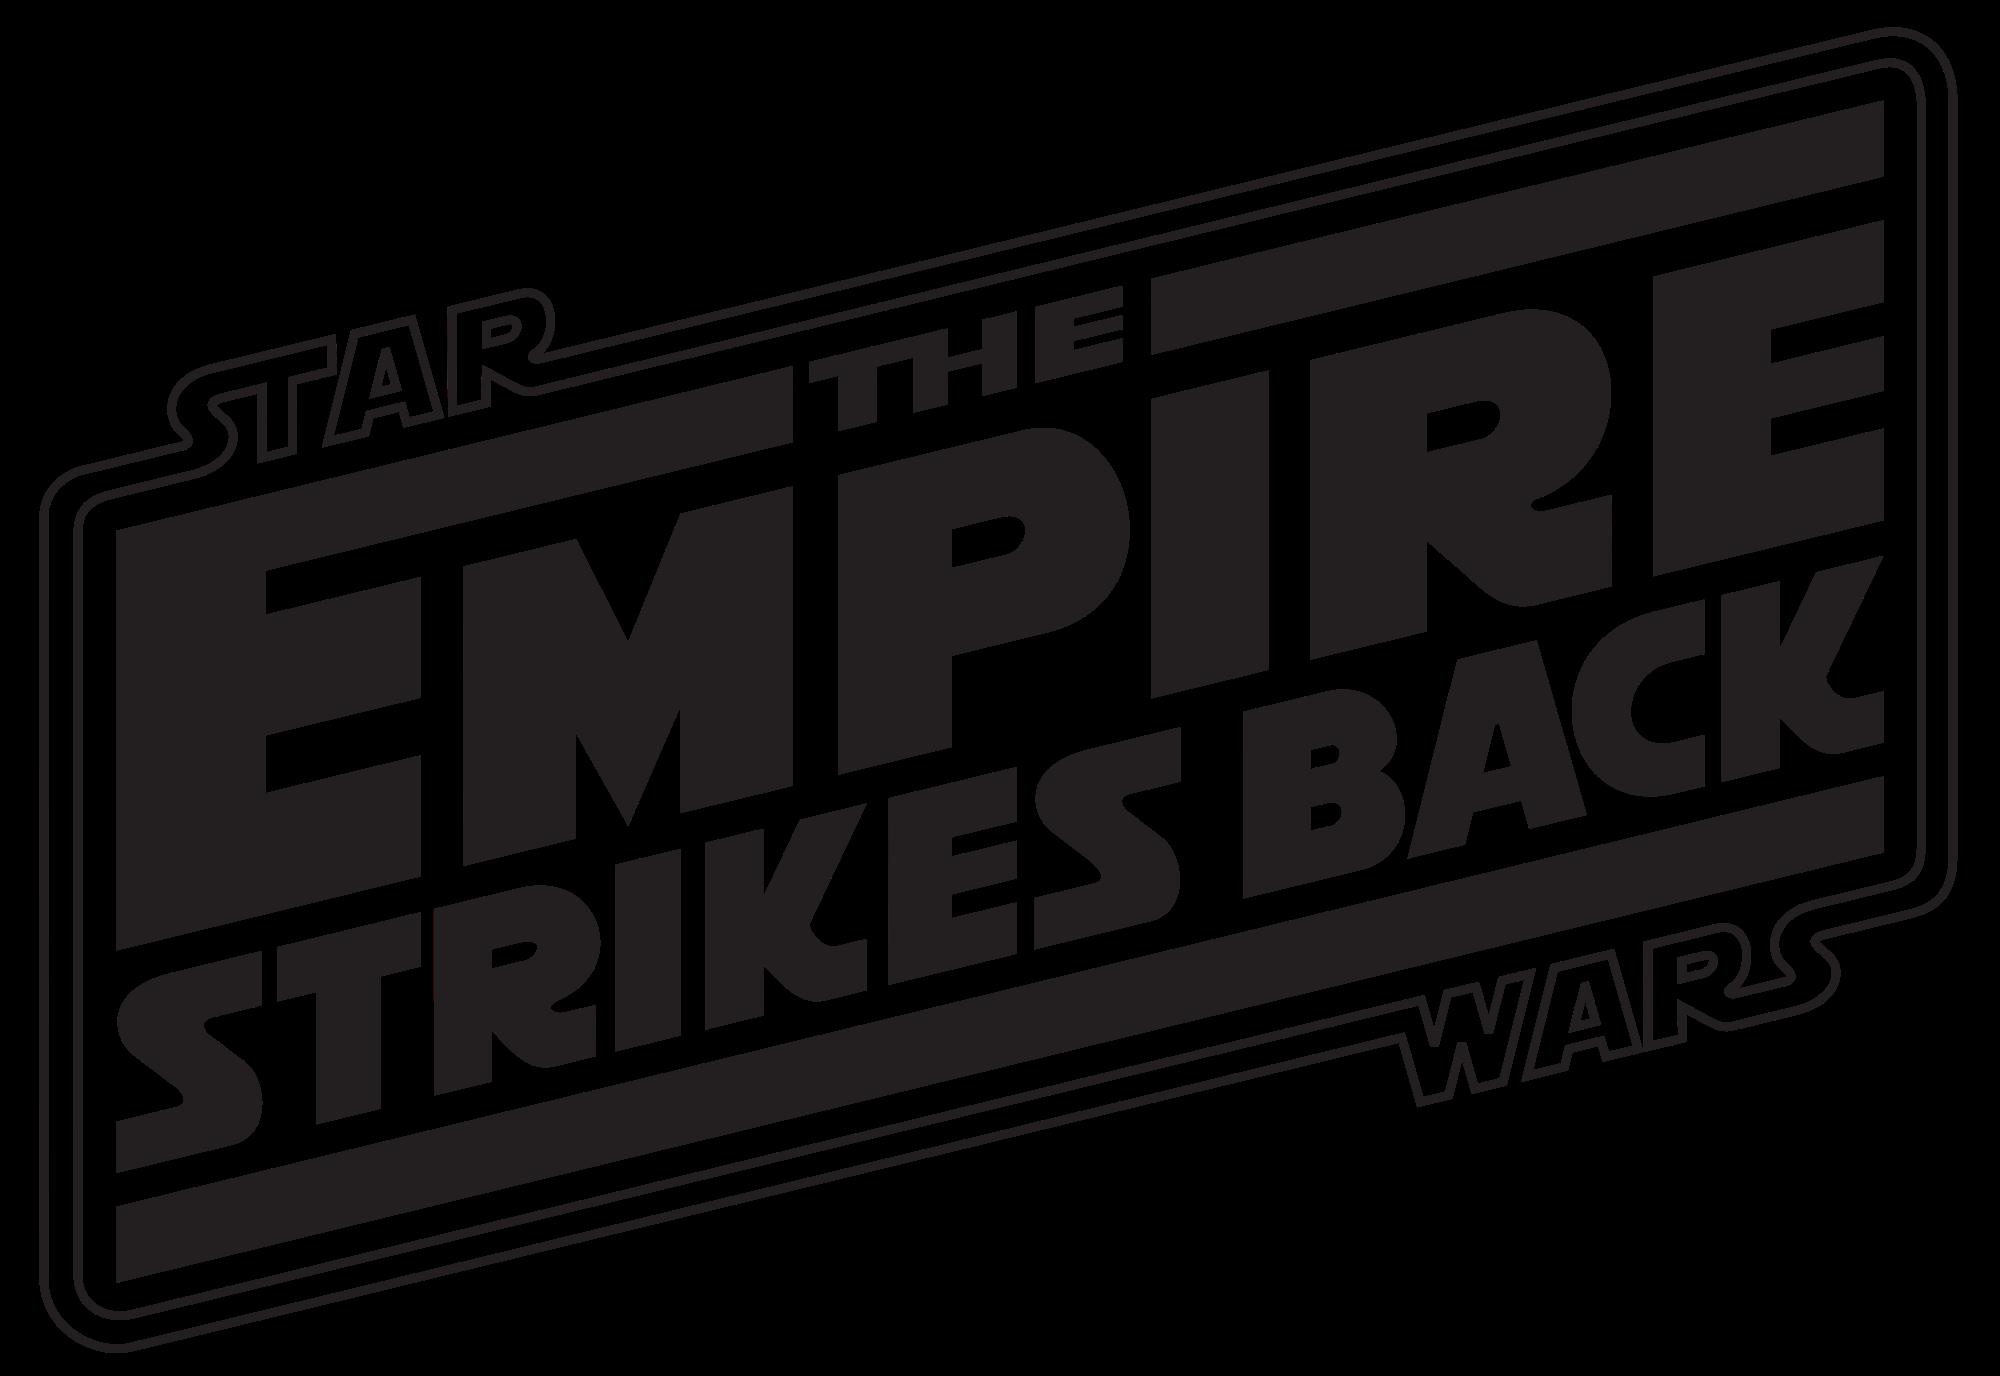 Image result for star wars empire strikes back logo.